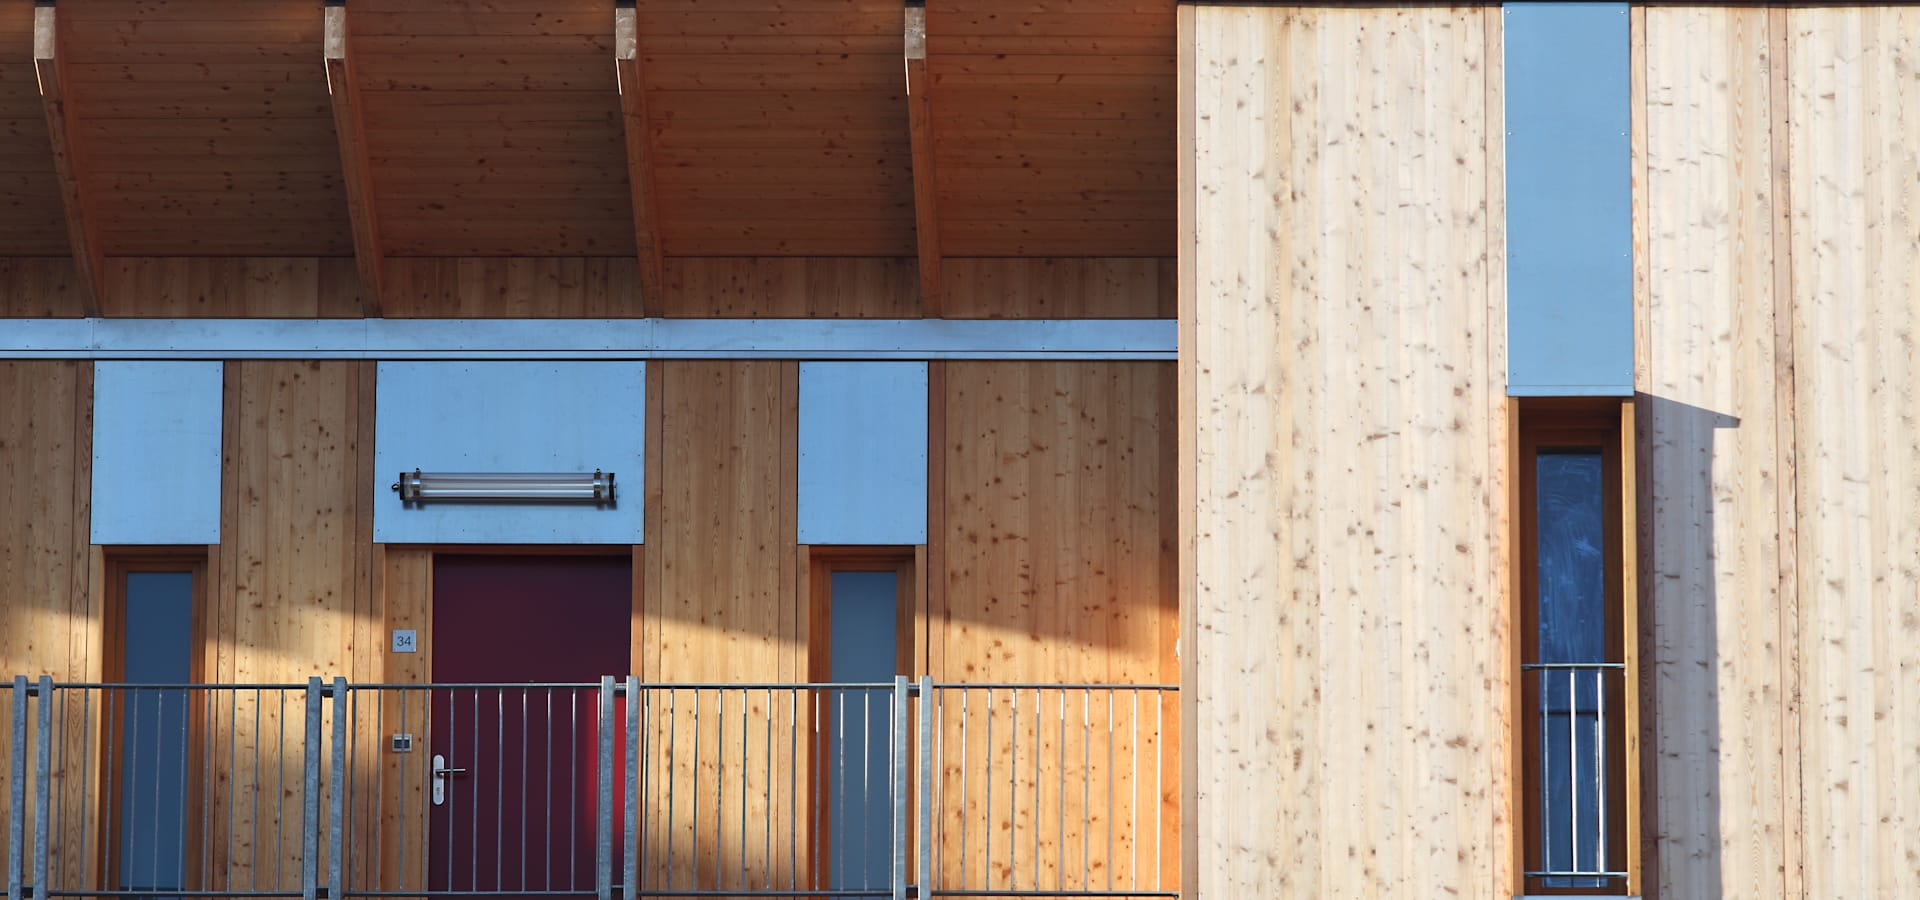 Atelier Architecture